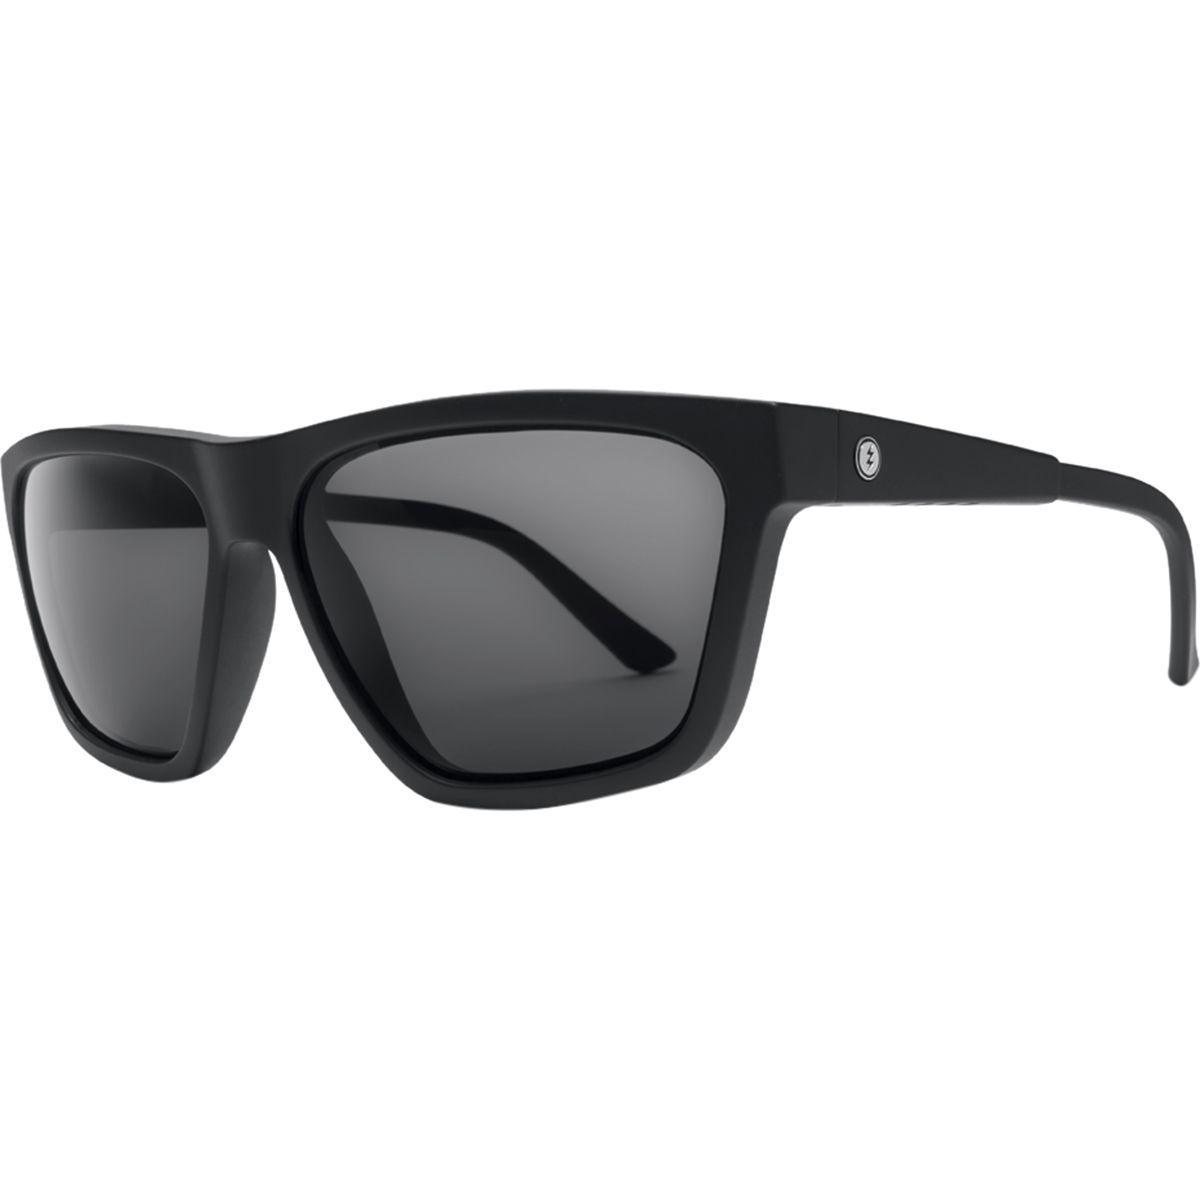 72144f6f01 Electric - Black Road Glacier Sunglasses - Polarized for Men - Lyst. View  fullscreen